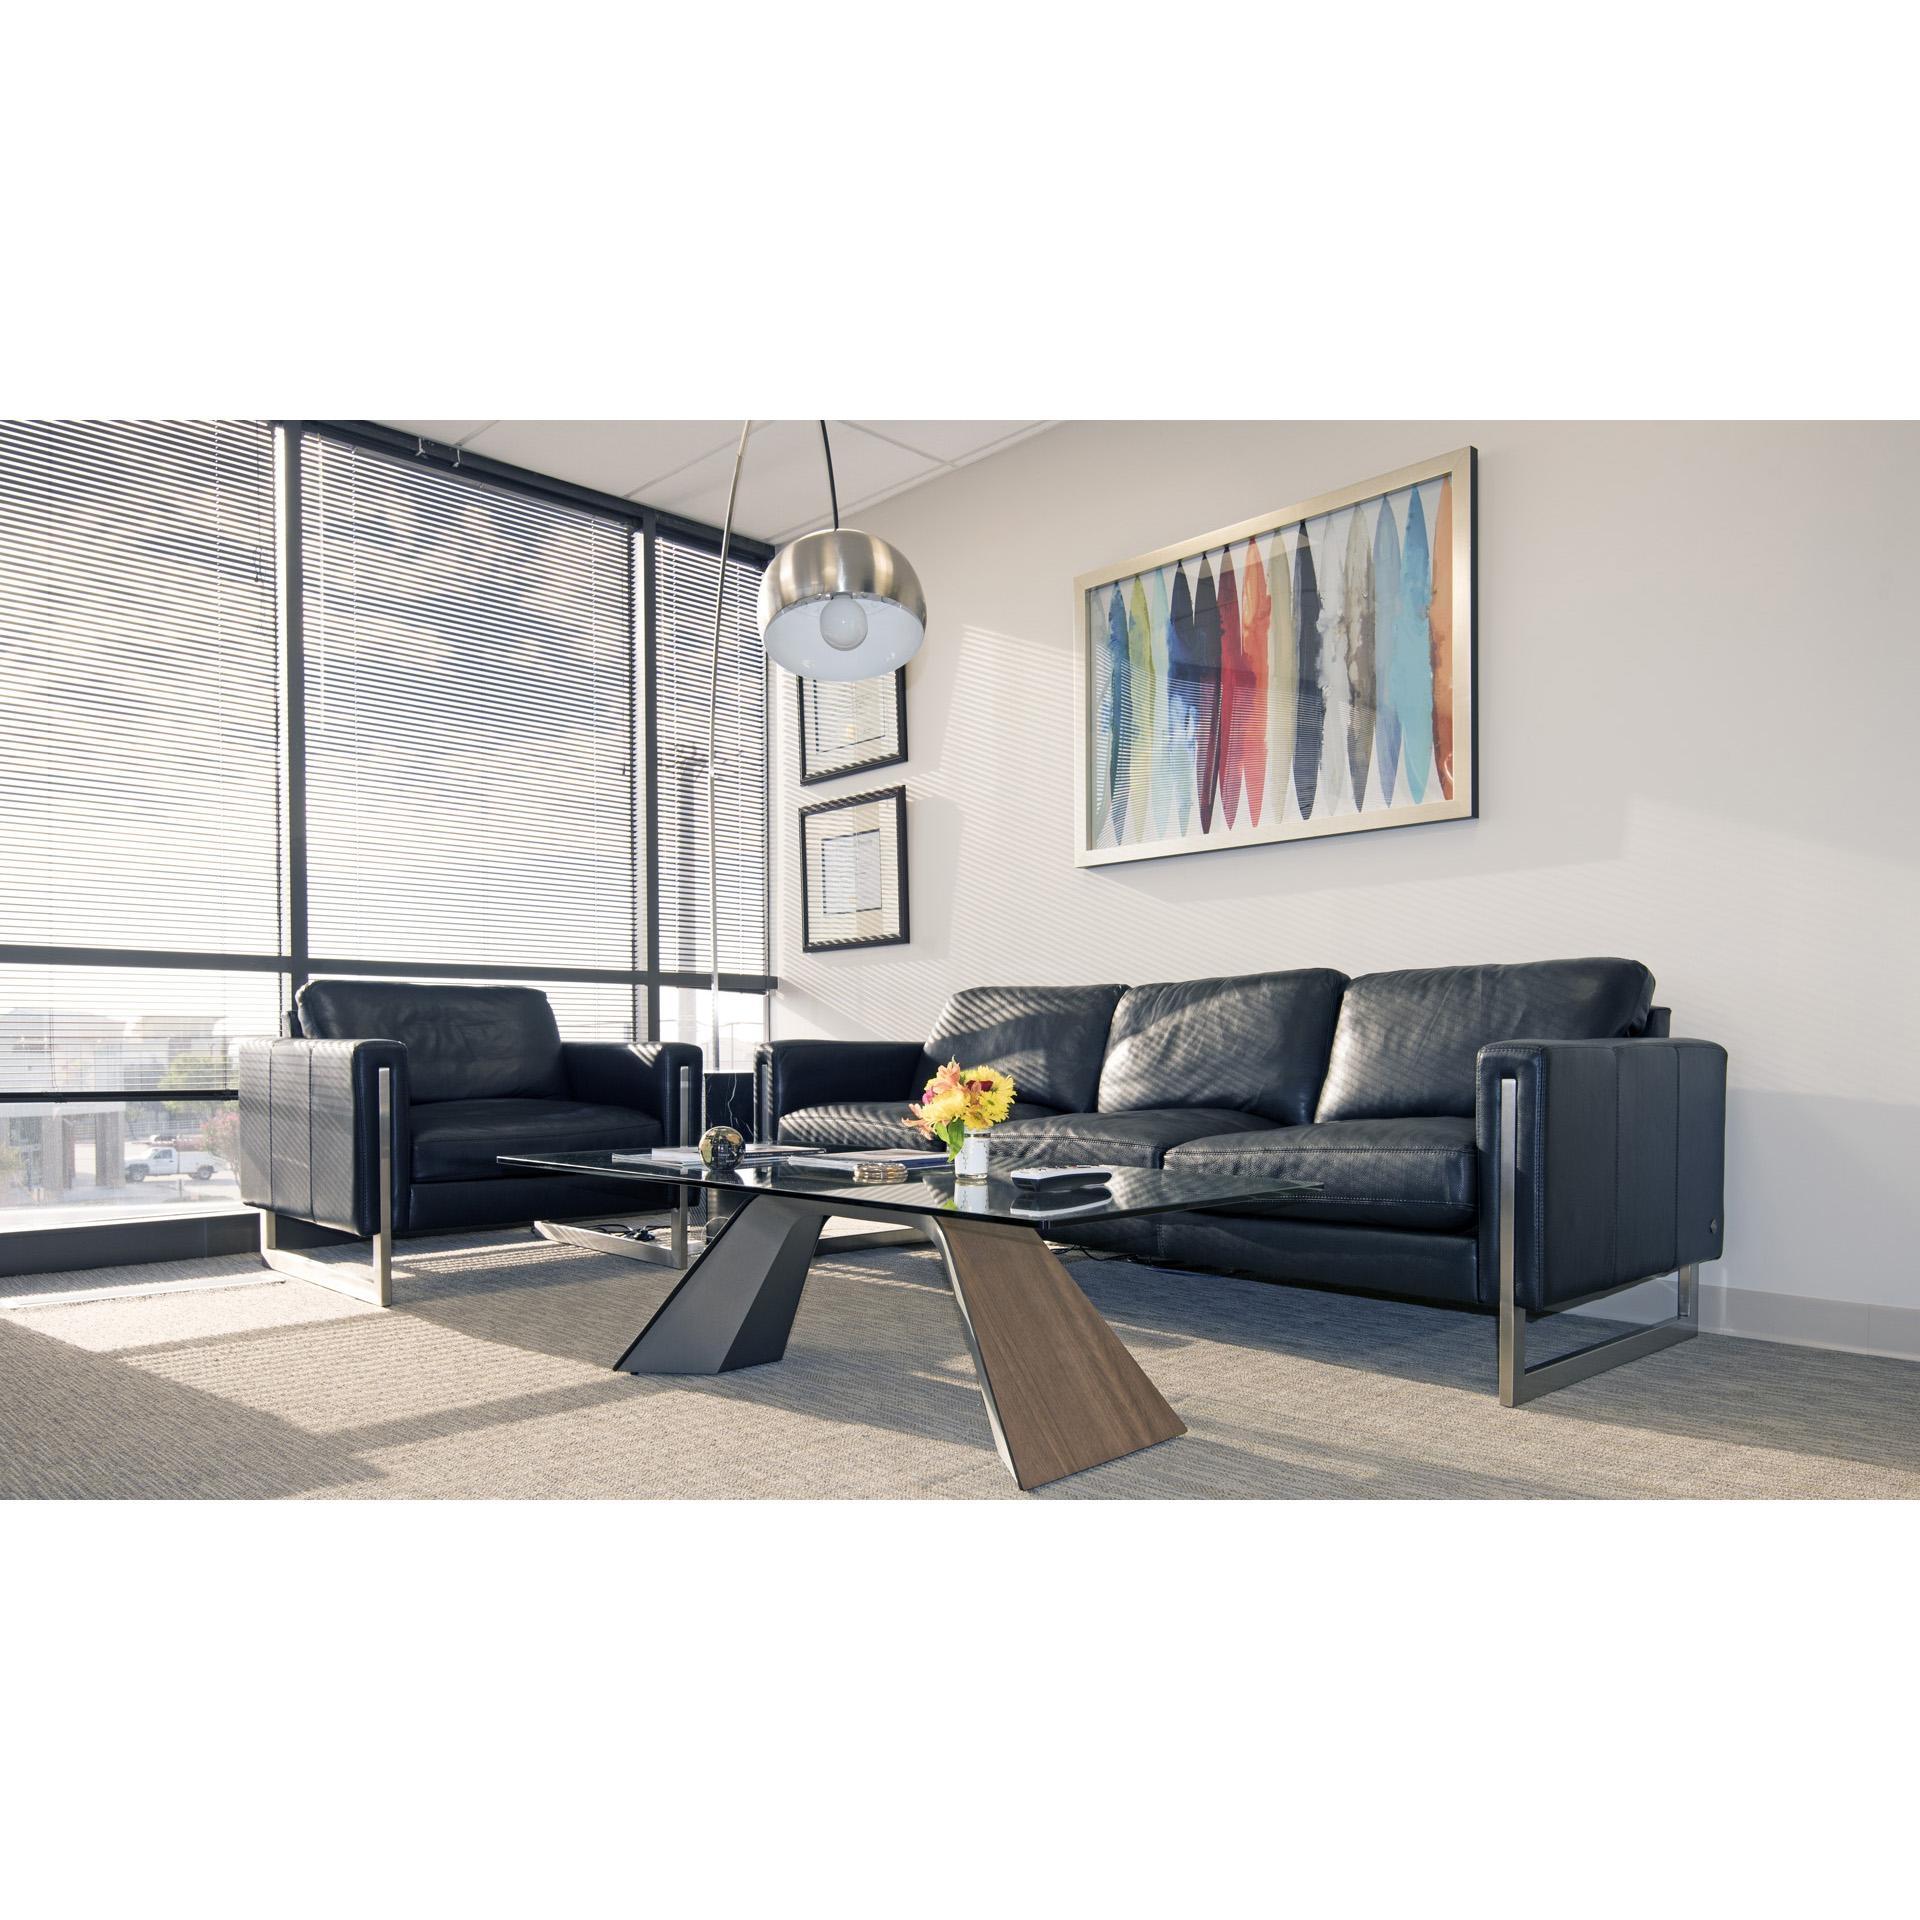 Modern Sofas Savinoamerican Leather Black | Cantoni In Cantoni Sofas (View 13 of 20)